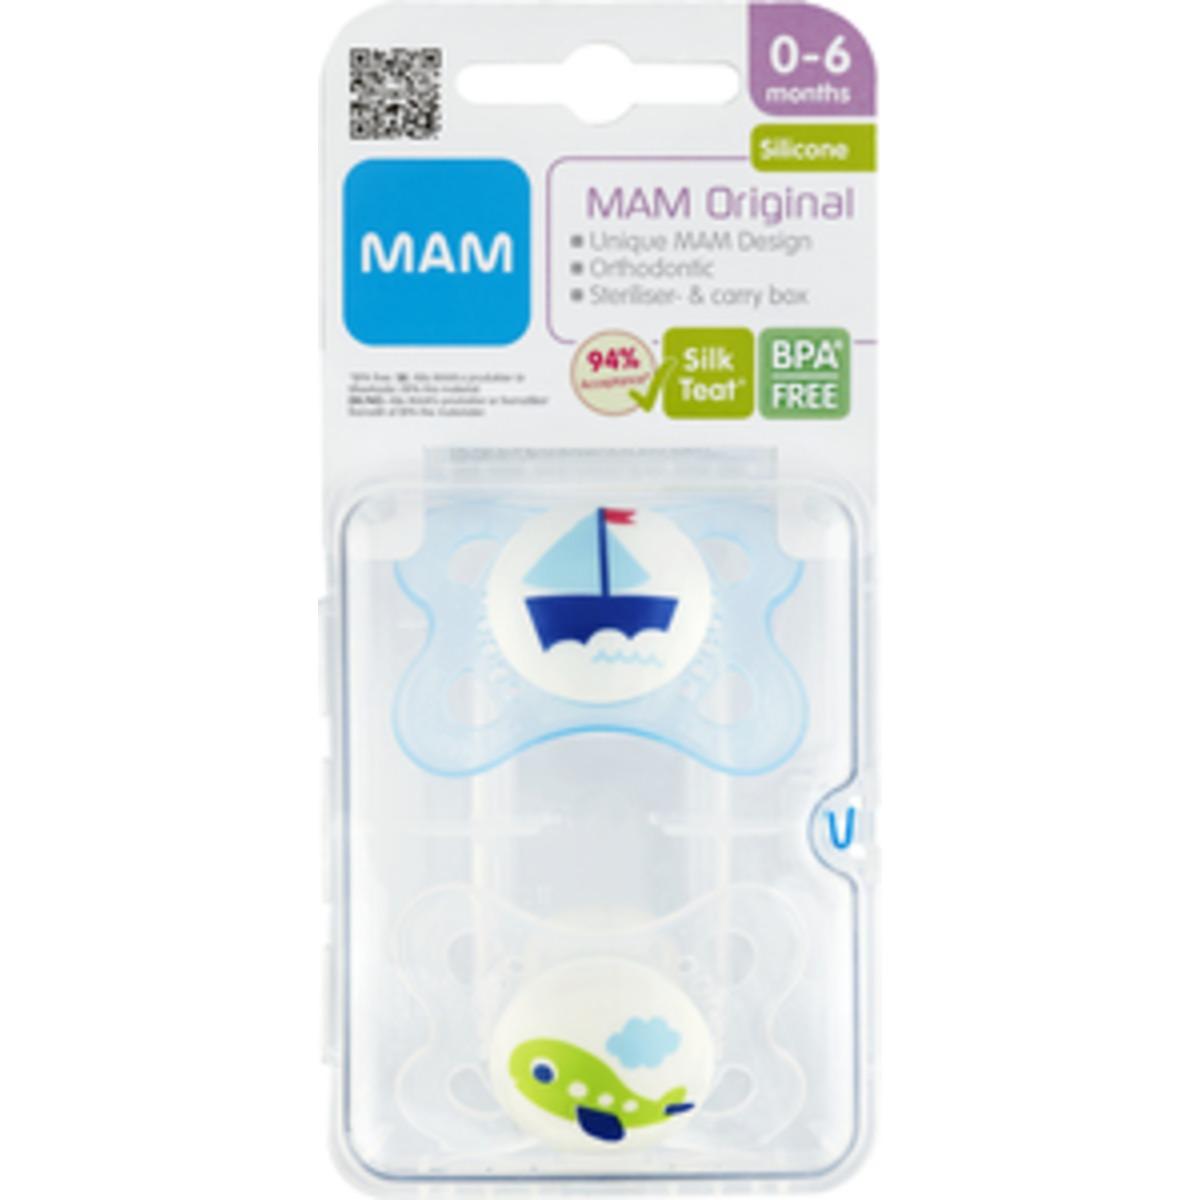 MAM Original 0-6 Mdr Silk Teat - 2 Stk.